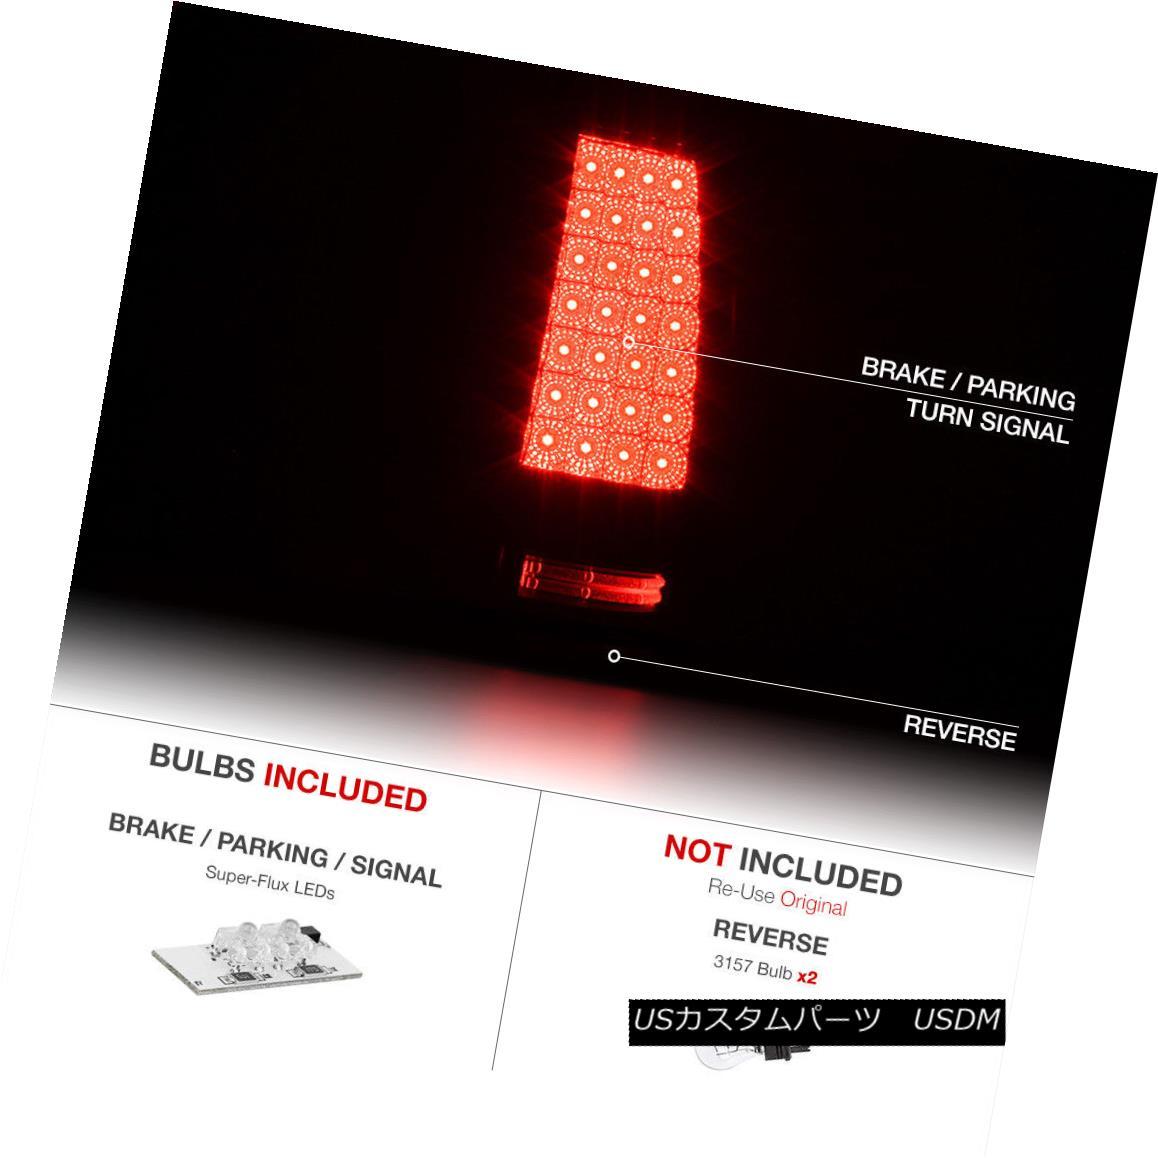 For Chevy Silverado 1500 1999-2002 CG Black LED Turn Signal//Parking Lights